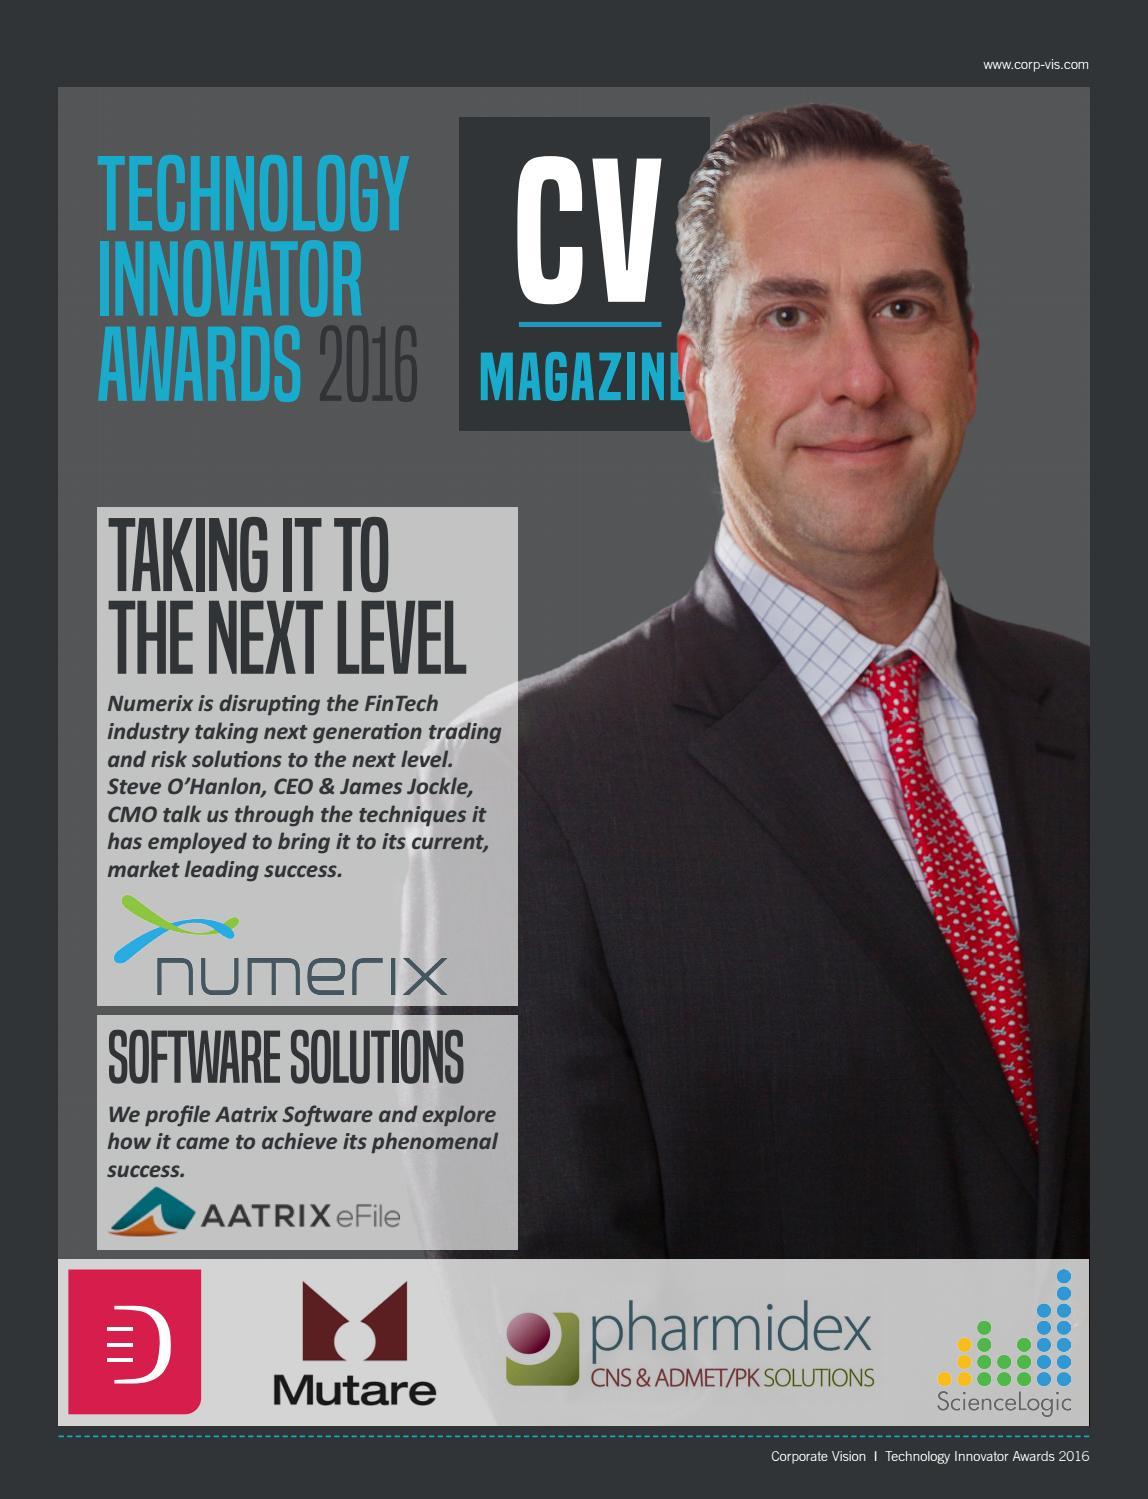 fed18eed4cc CV 2016 Tech Innovator packages by AI Global Media - issuu